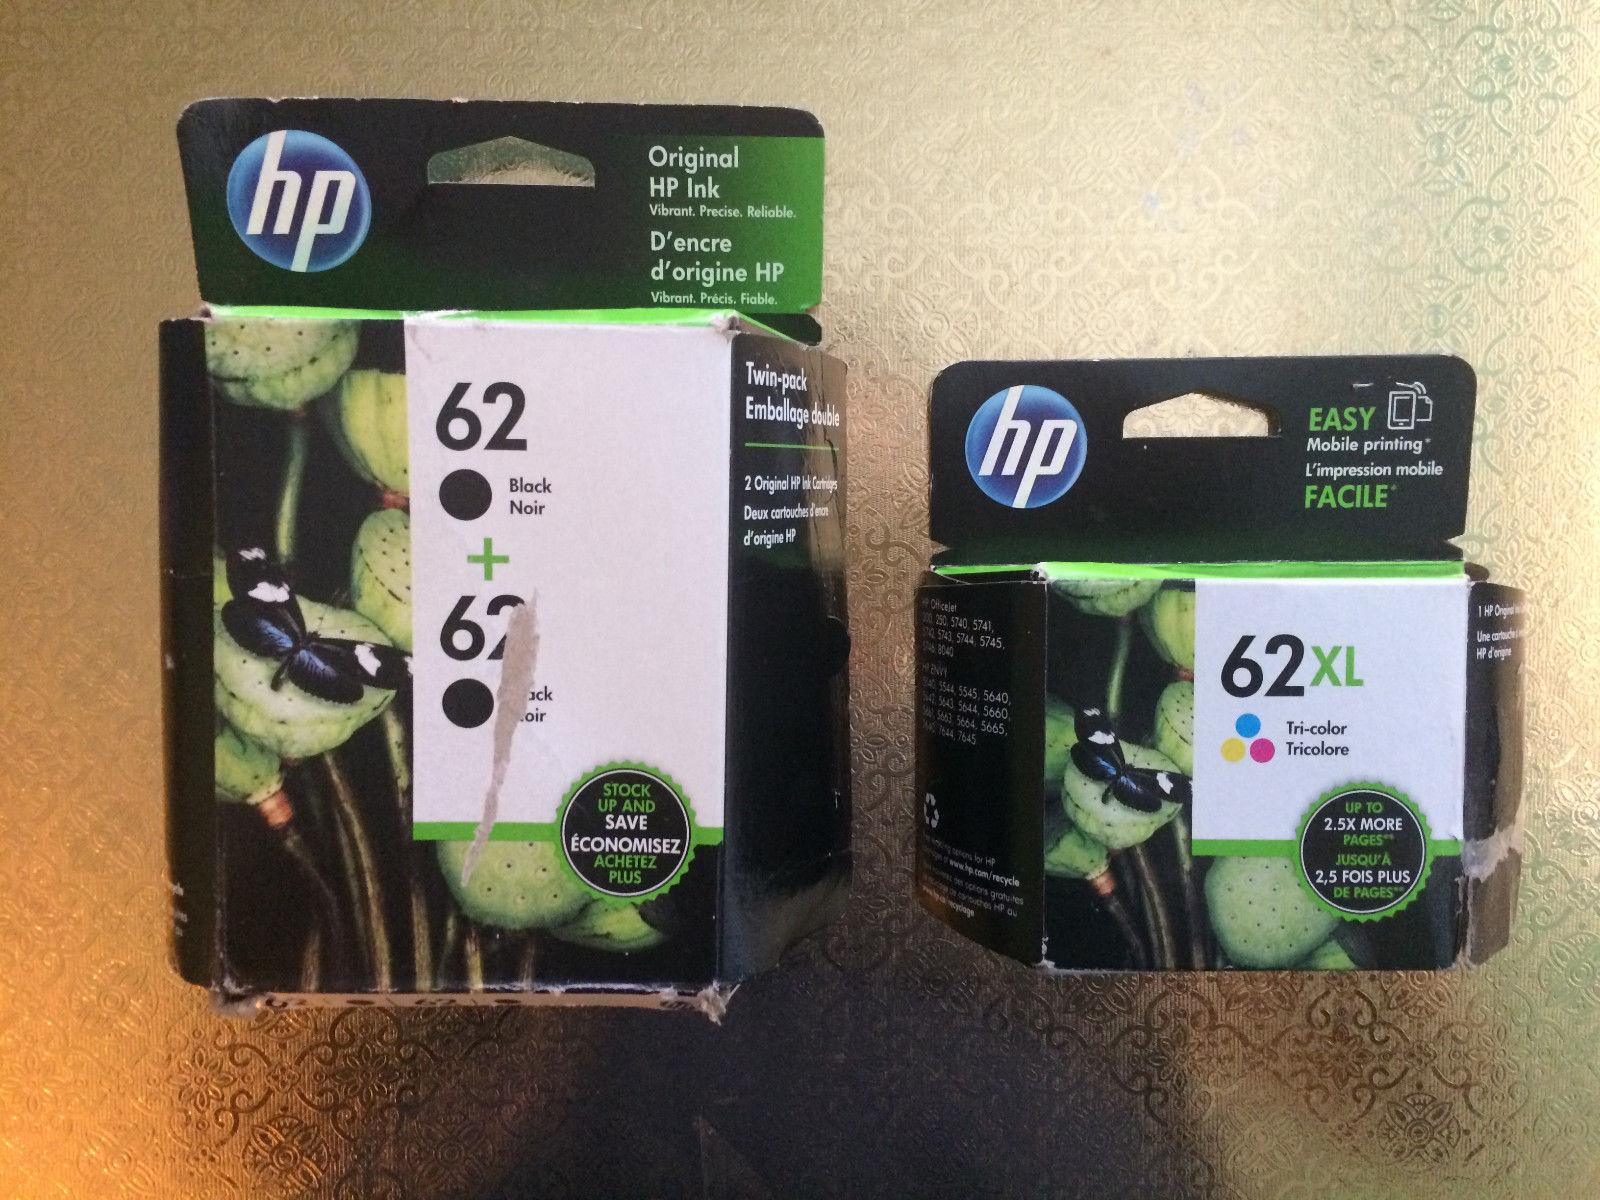 10//2019 NEW SEALED IN BOX! GENUINE ORIGINAL HP 74 BLACK INK CARTRIDGE EXP